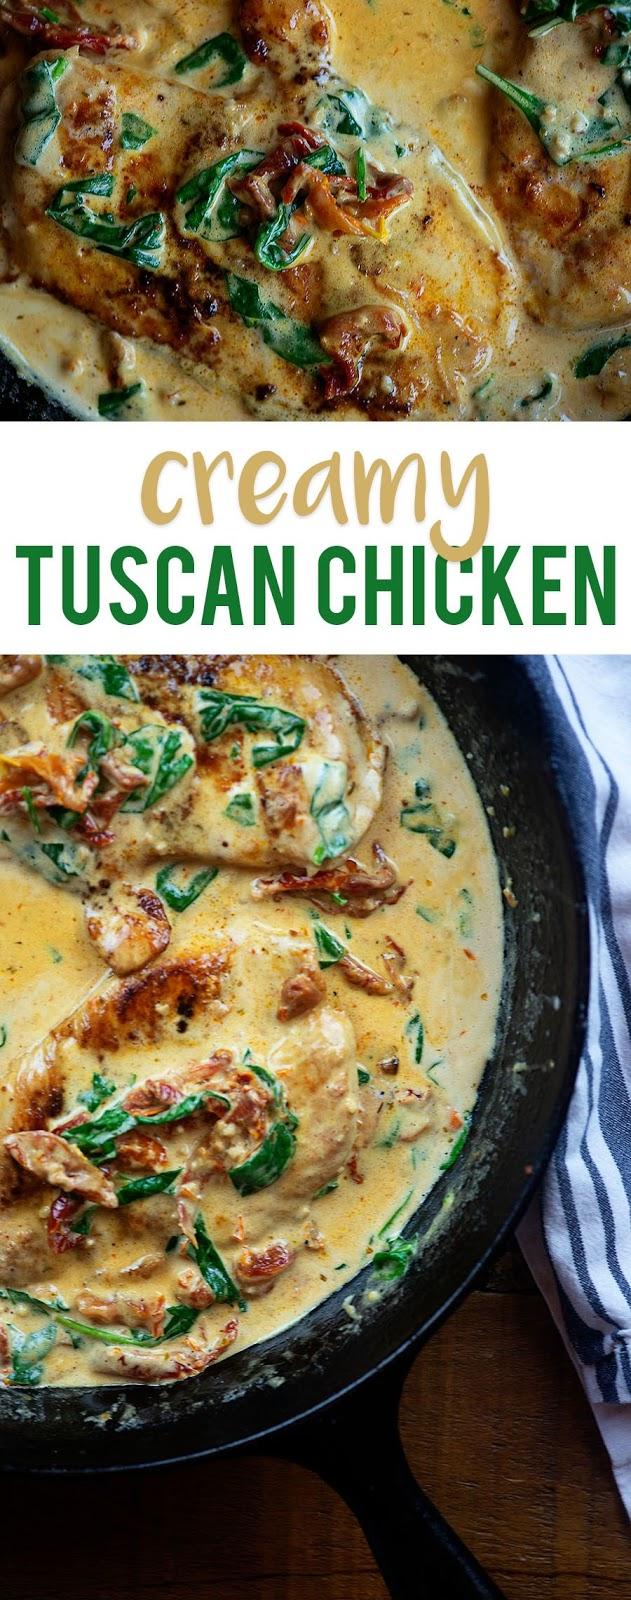 Creamy Tuscan Chicken Recipes